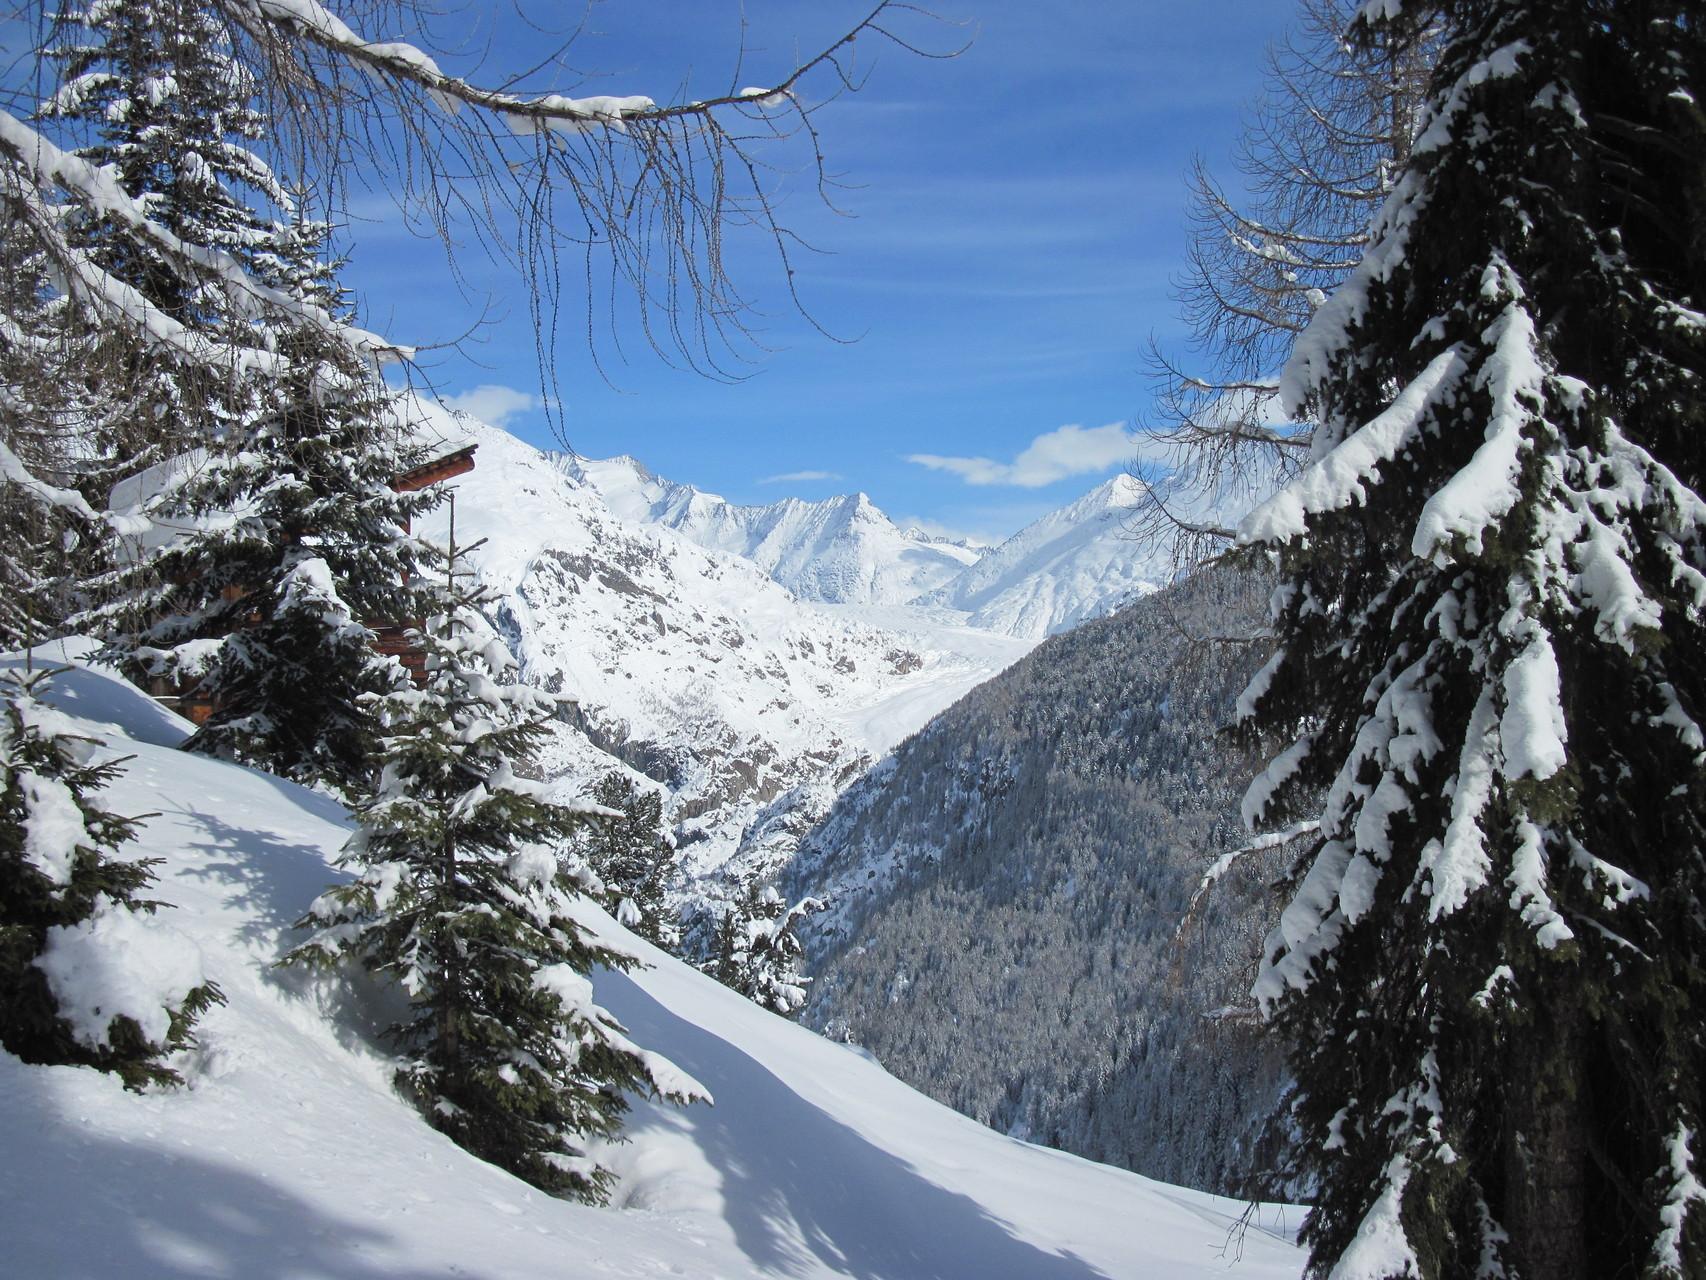 Ausblick auf den Grossen Aletschgletscher